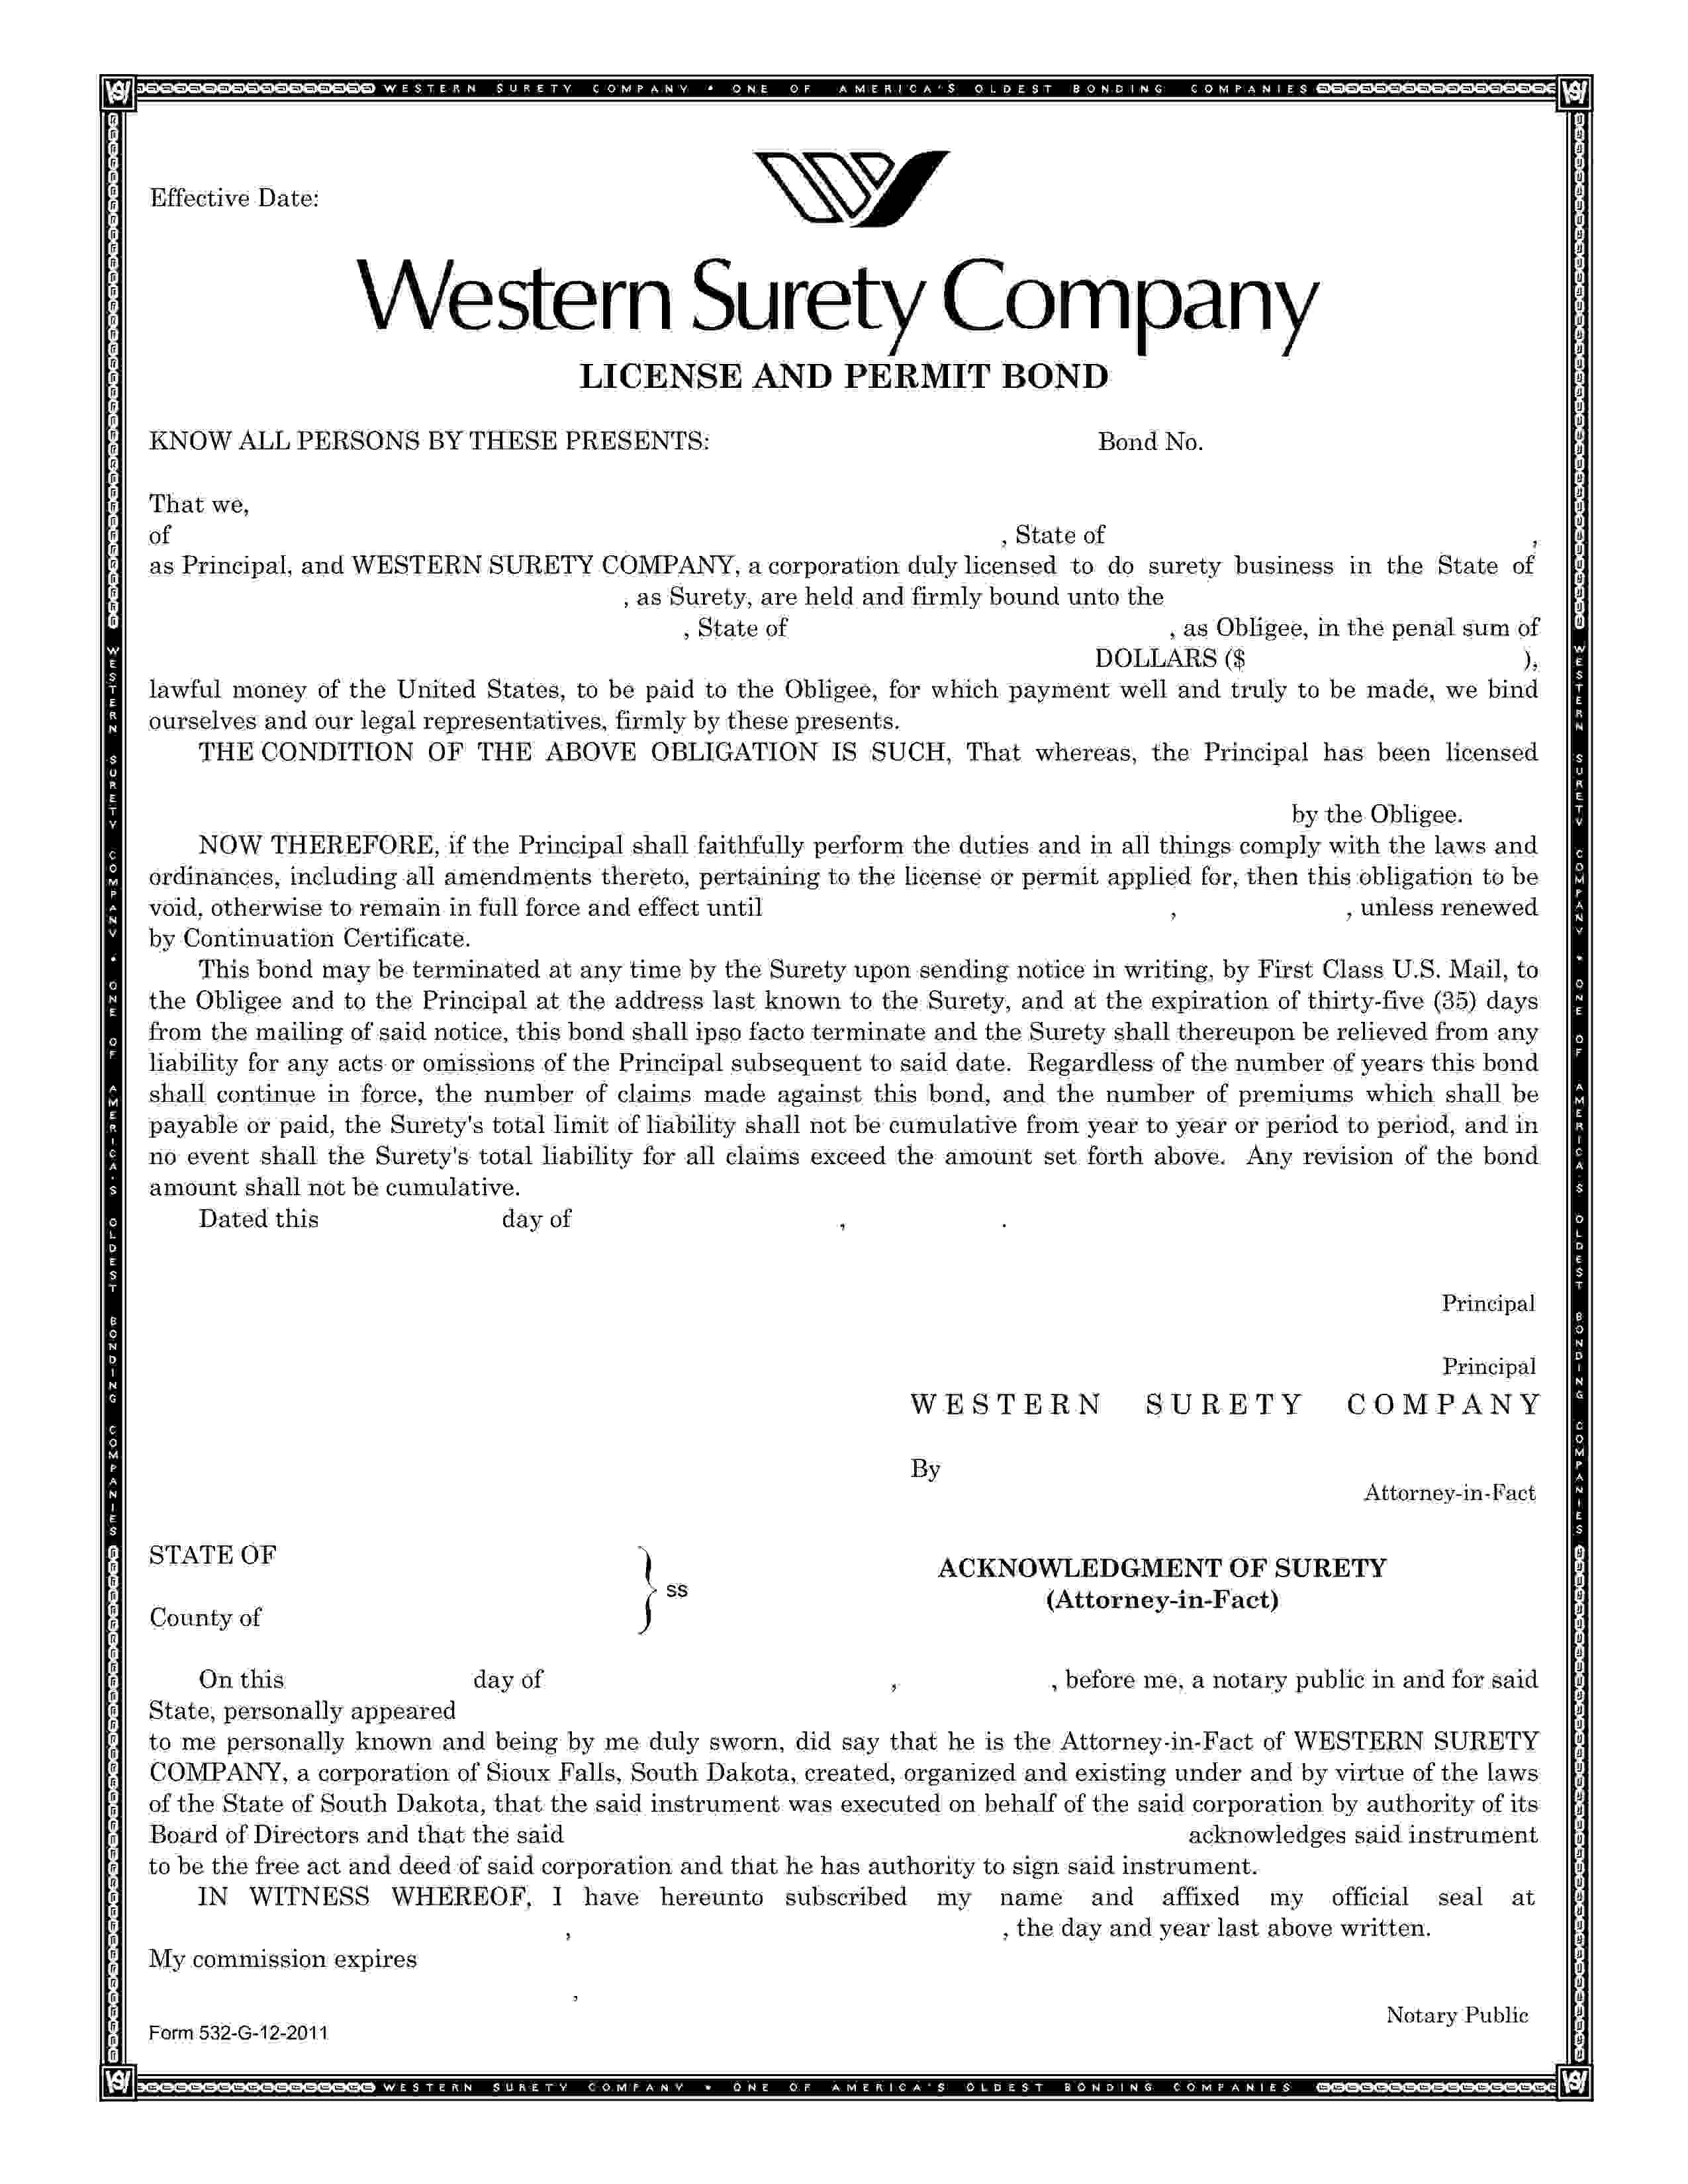 Marshall - County License/Permit sample image